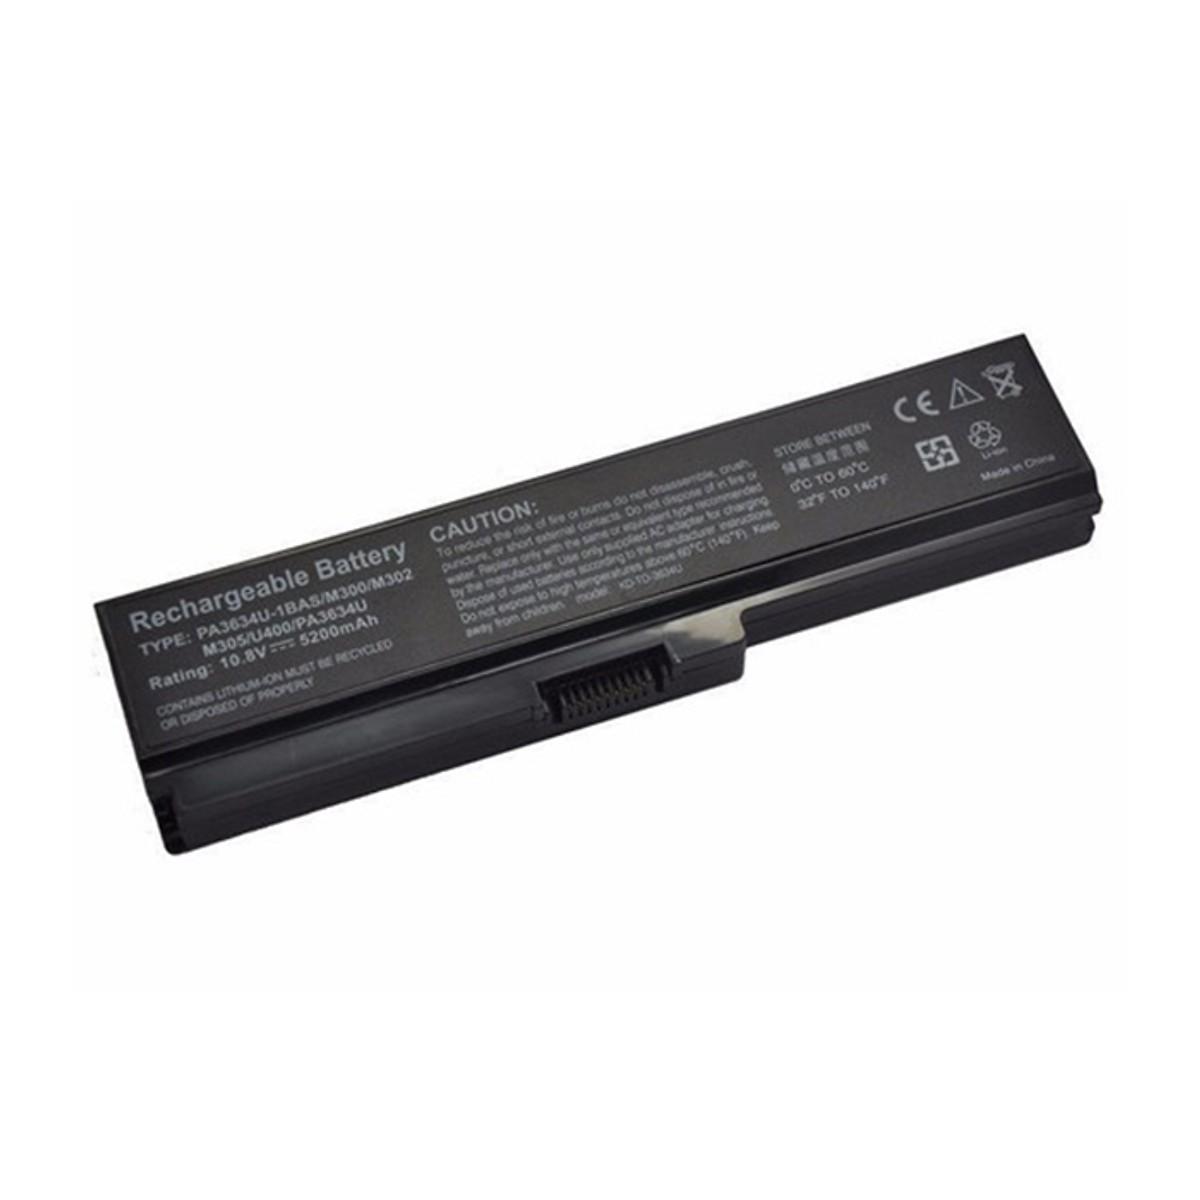 Pin Dành Cho Laptop Toshiba L635, L640, L645, L650, L655, L670, L675,, M500, M505, M640, C650, C655, C640 L750, L755, L770, L730, L735 (Tặng bộ vệ sinh Laptop)